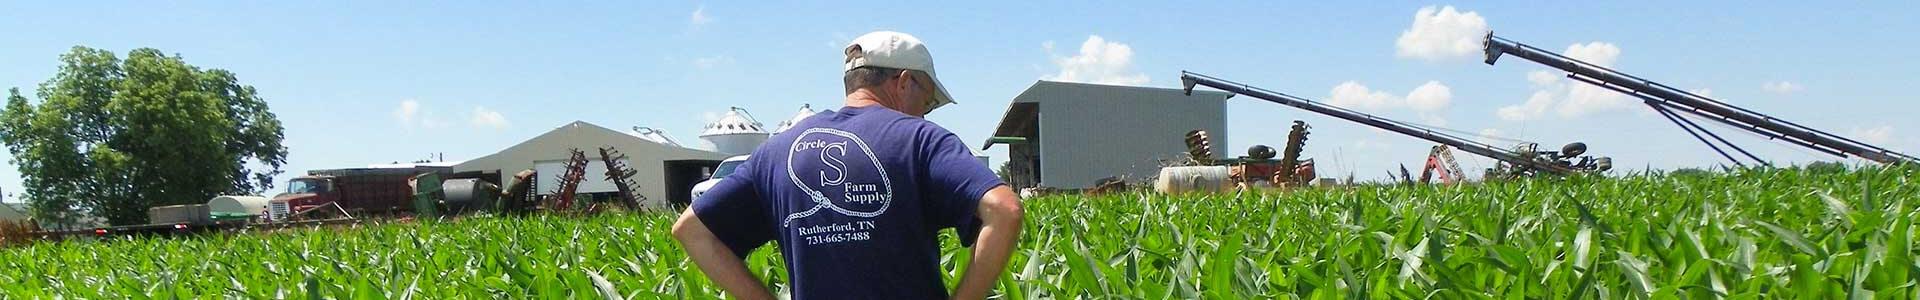 Liquid Plant Food and Fertilizer in TN | Circle S Farm Supply